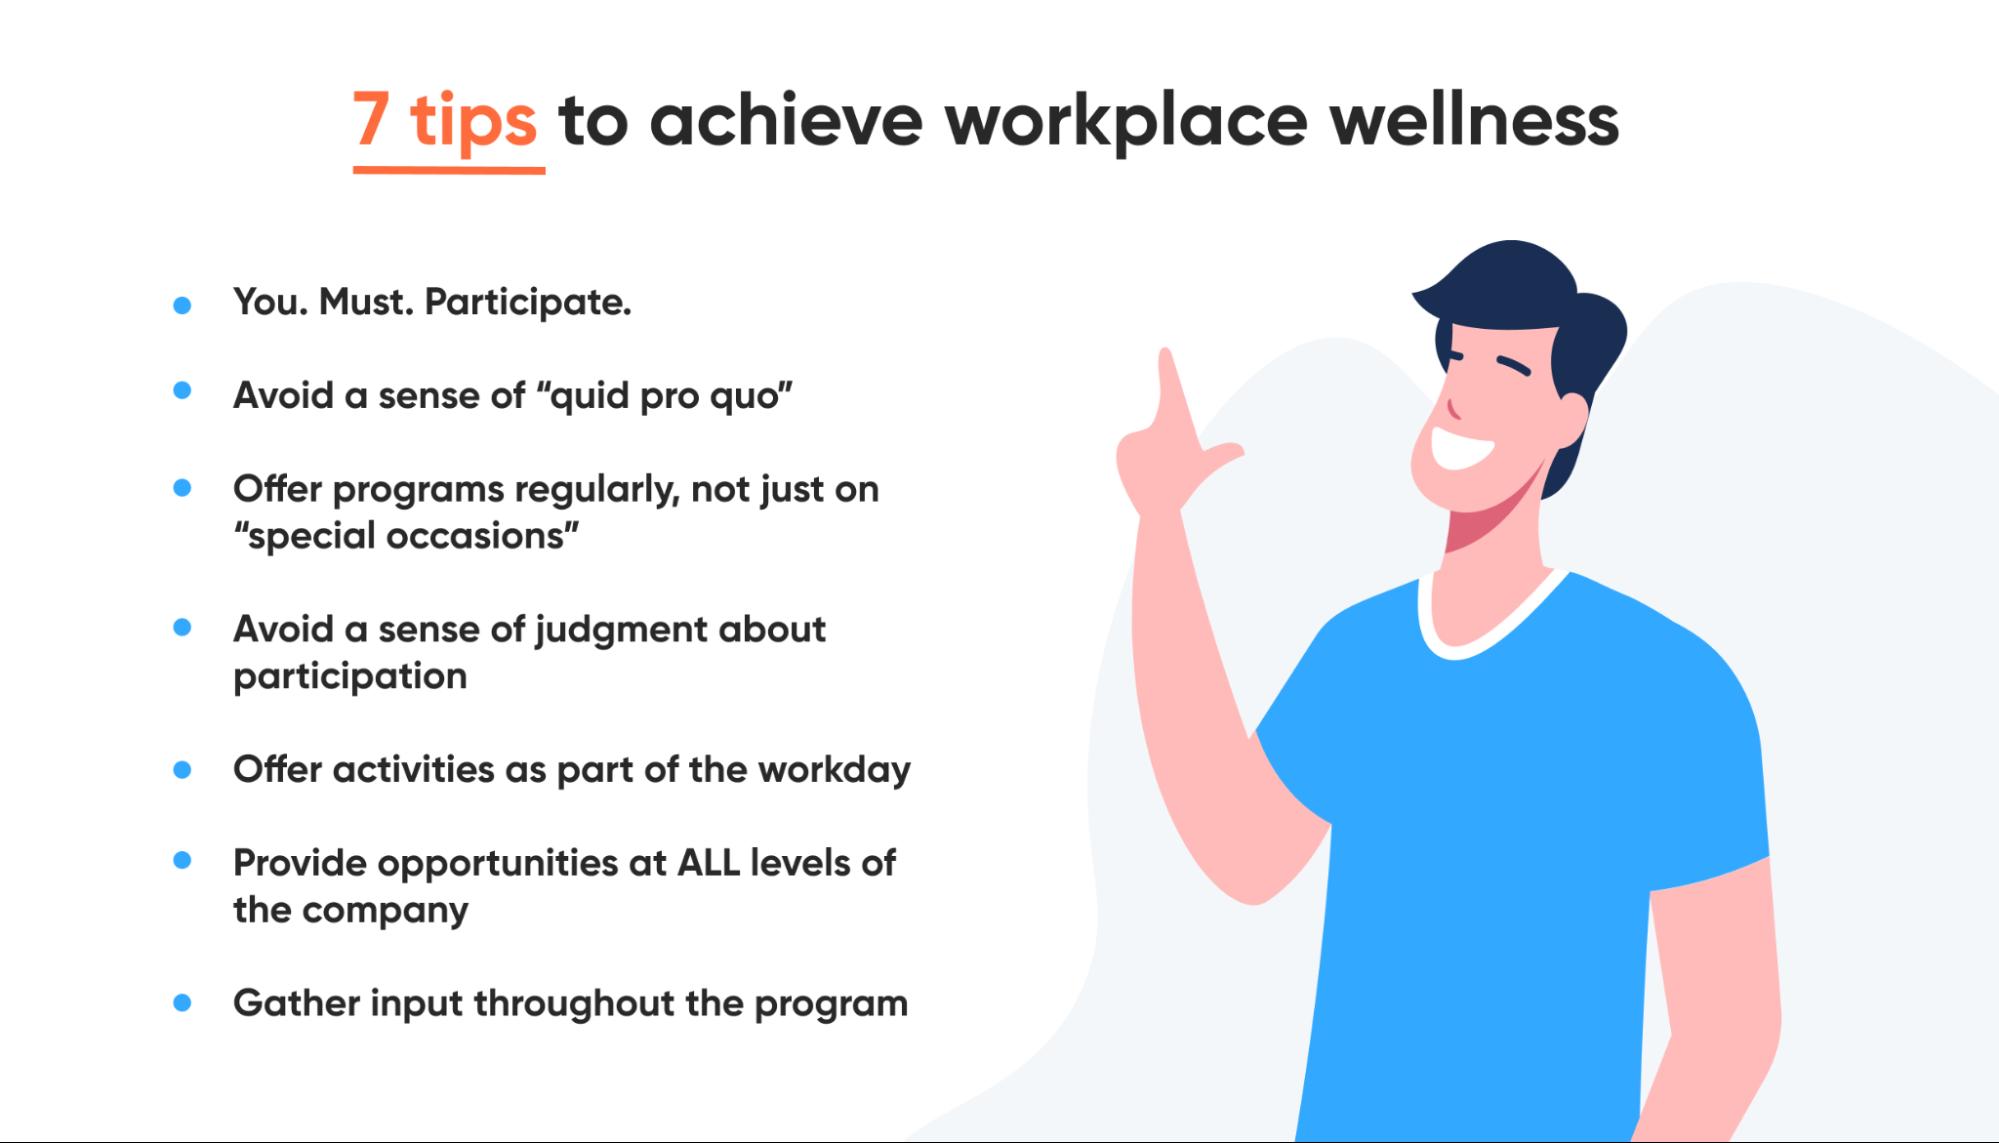 7-tips-to-achieve-workplace-wellness